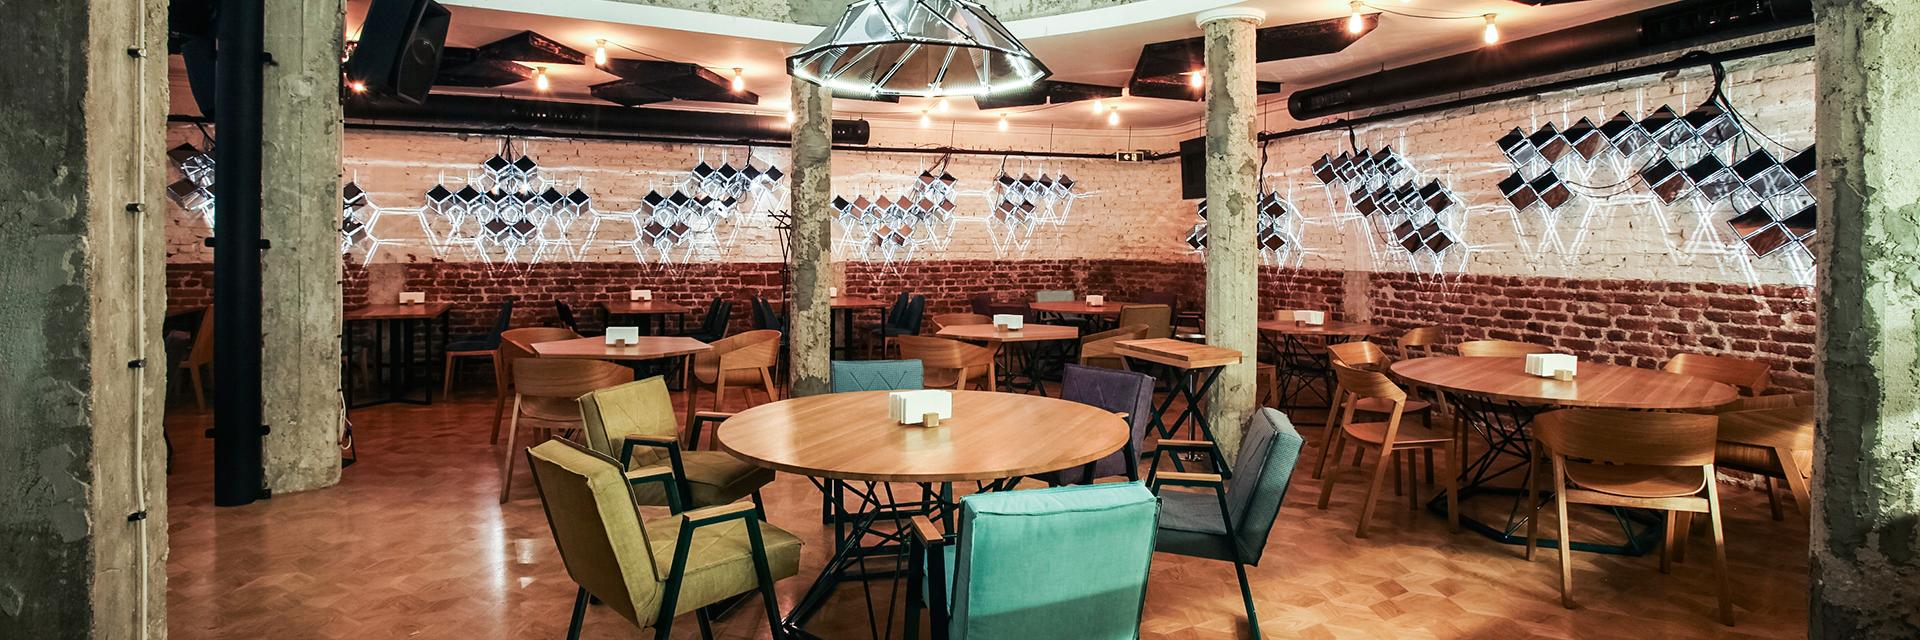 cosmos, restaurant design, gourmet restaurant